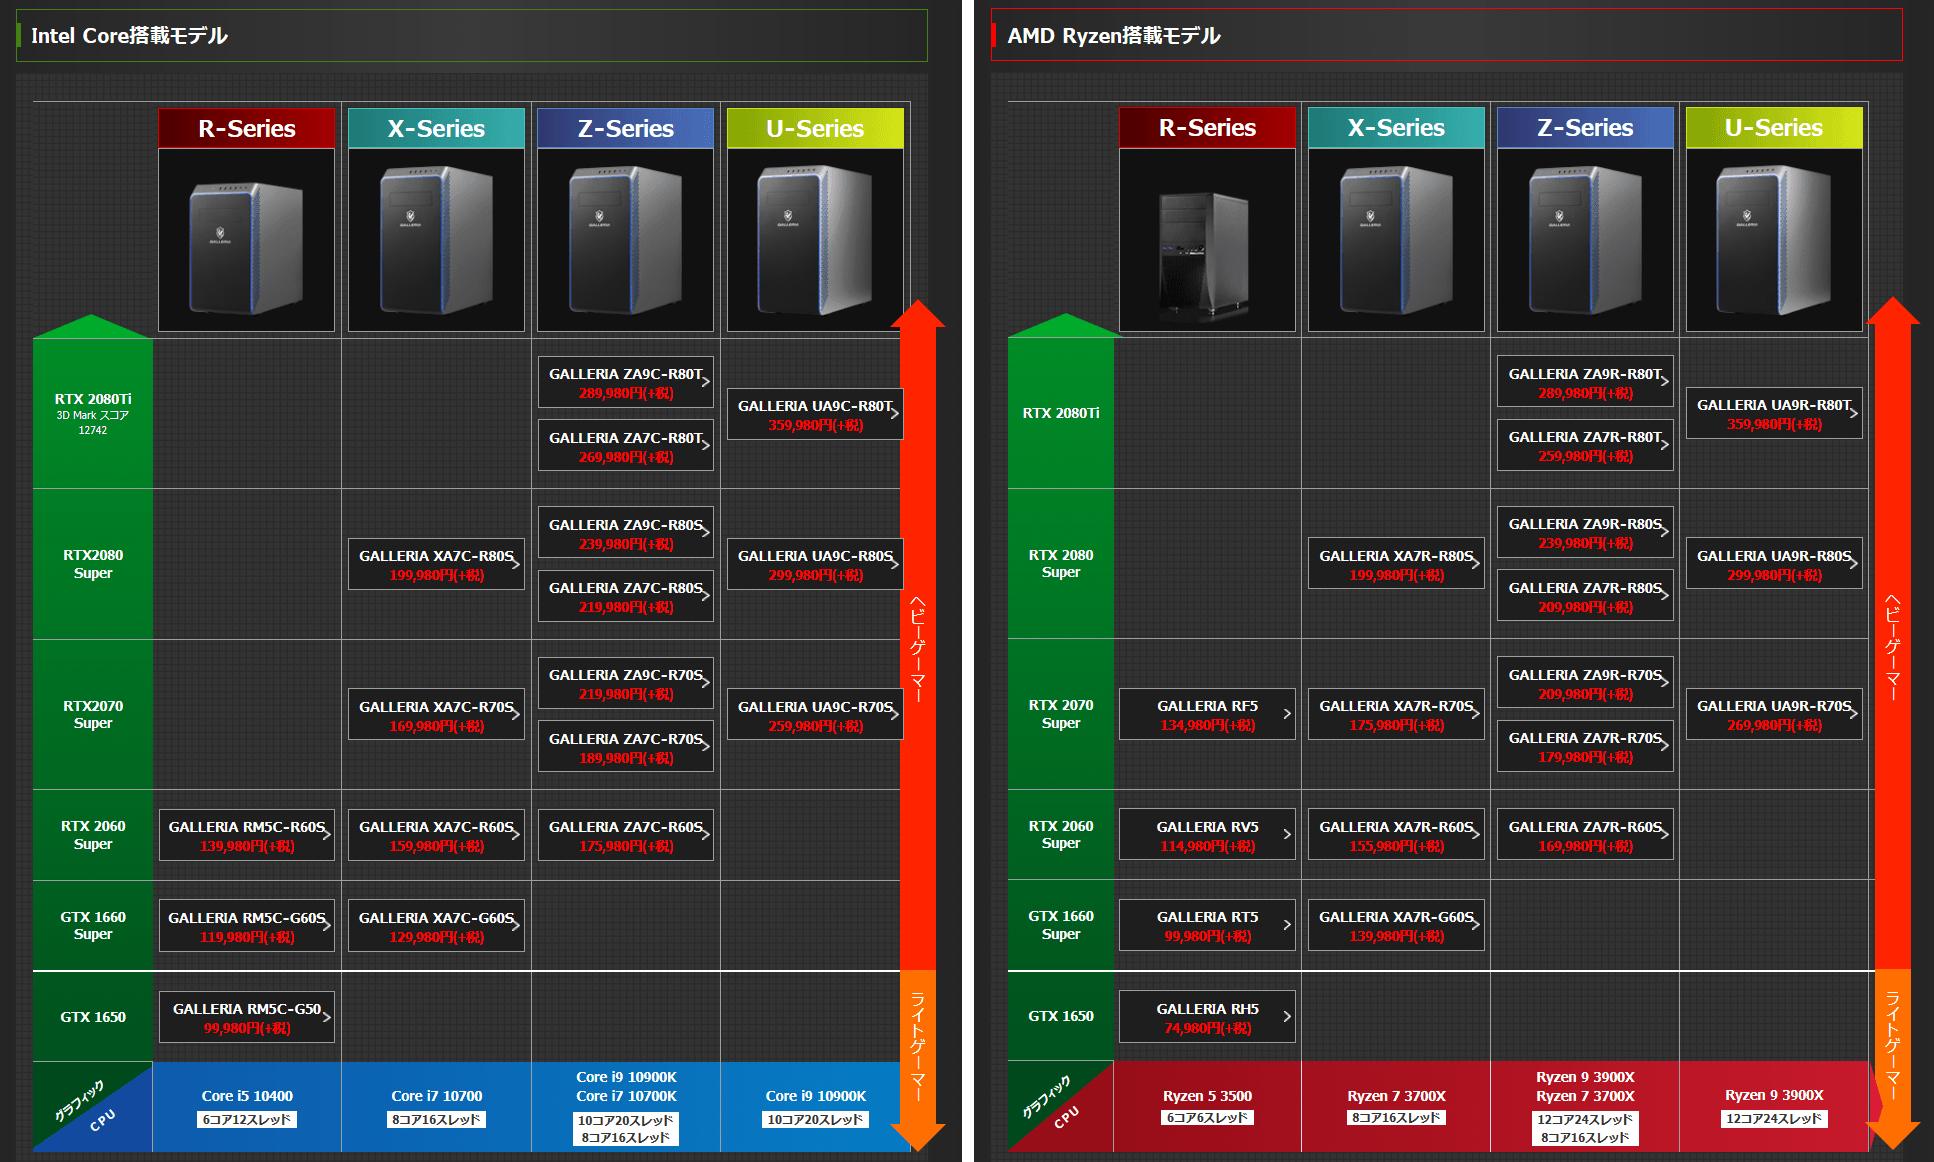 GALLERIA_gaming-desktop_Intel-AMD